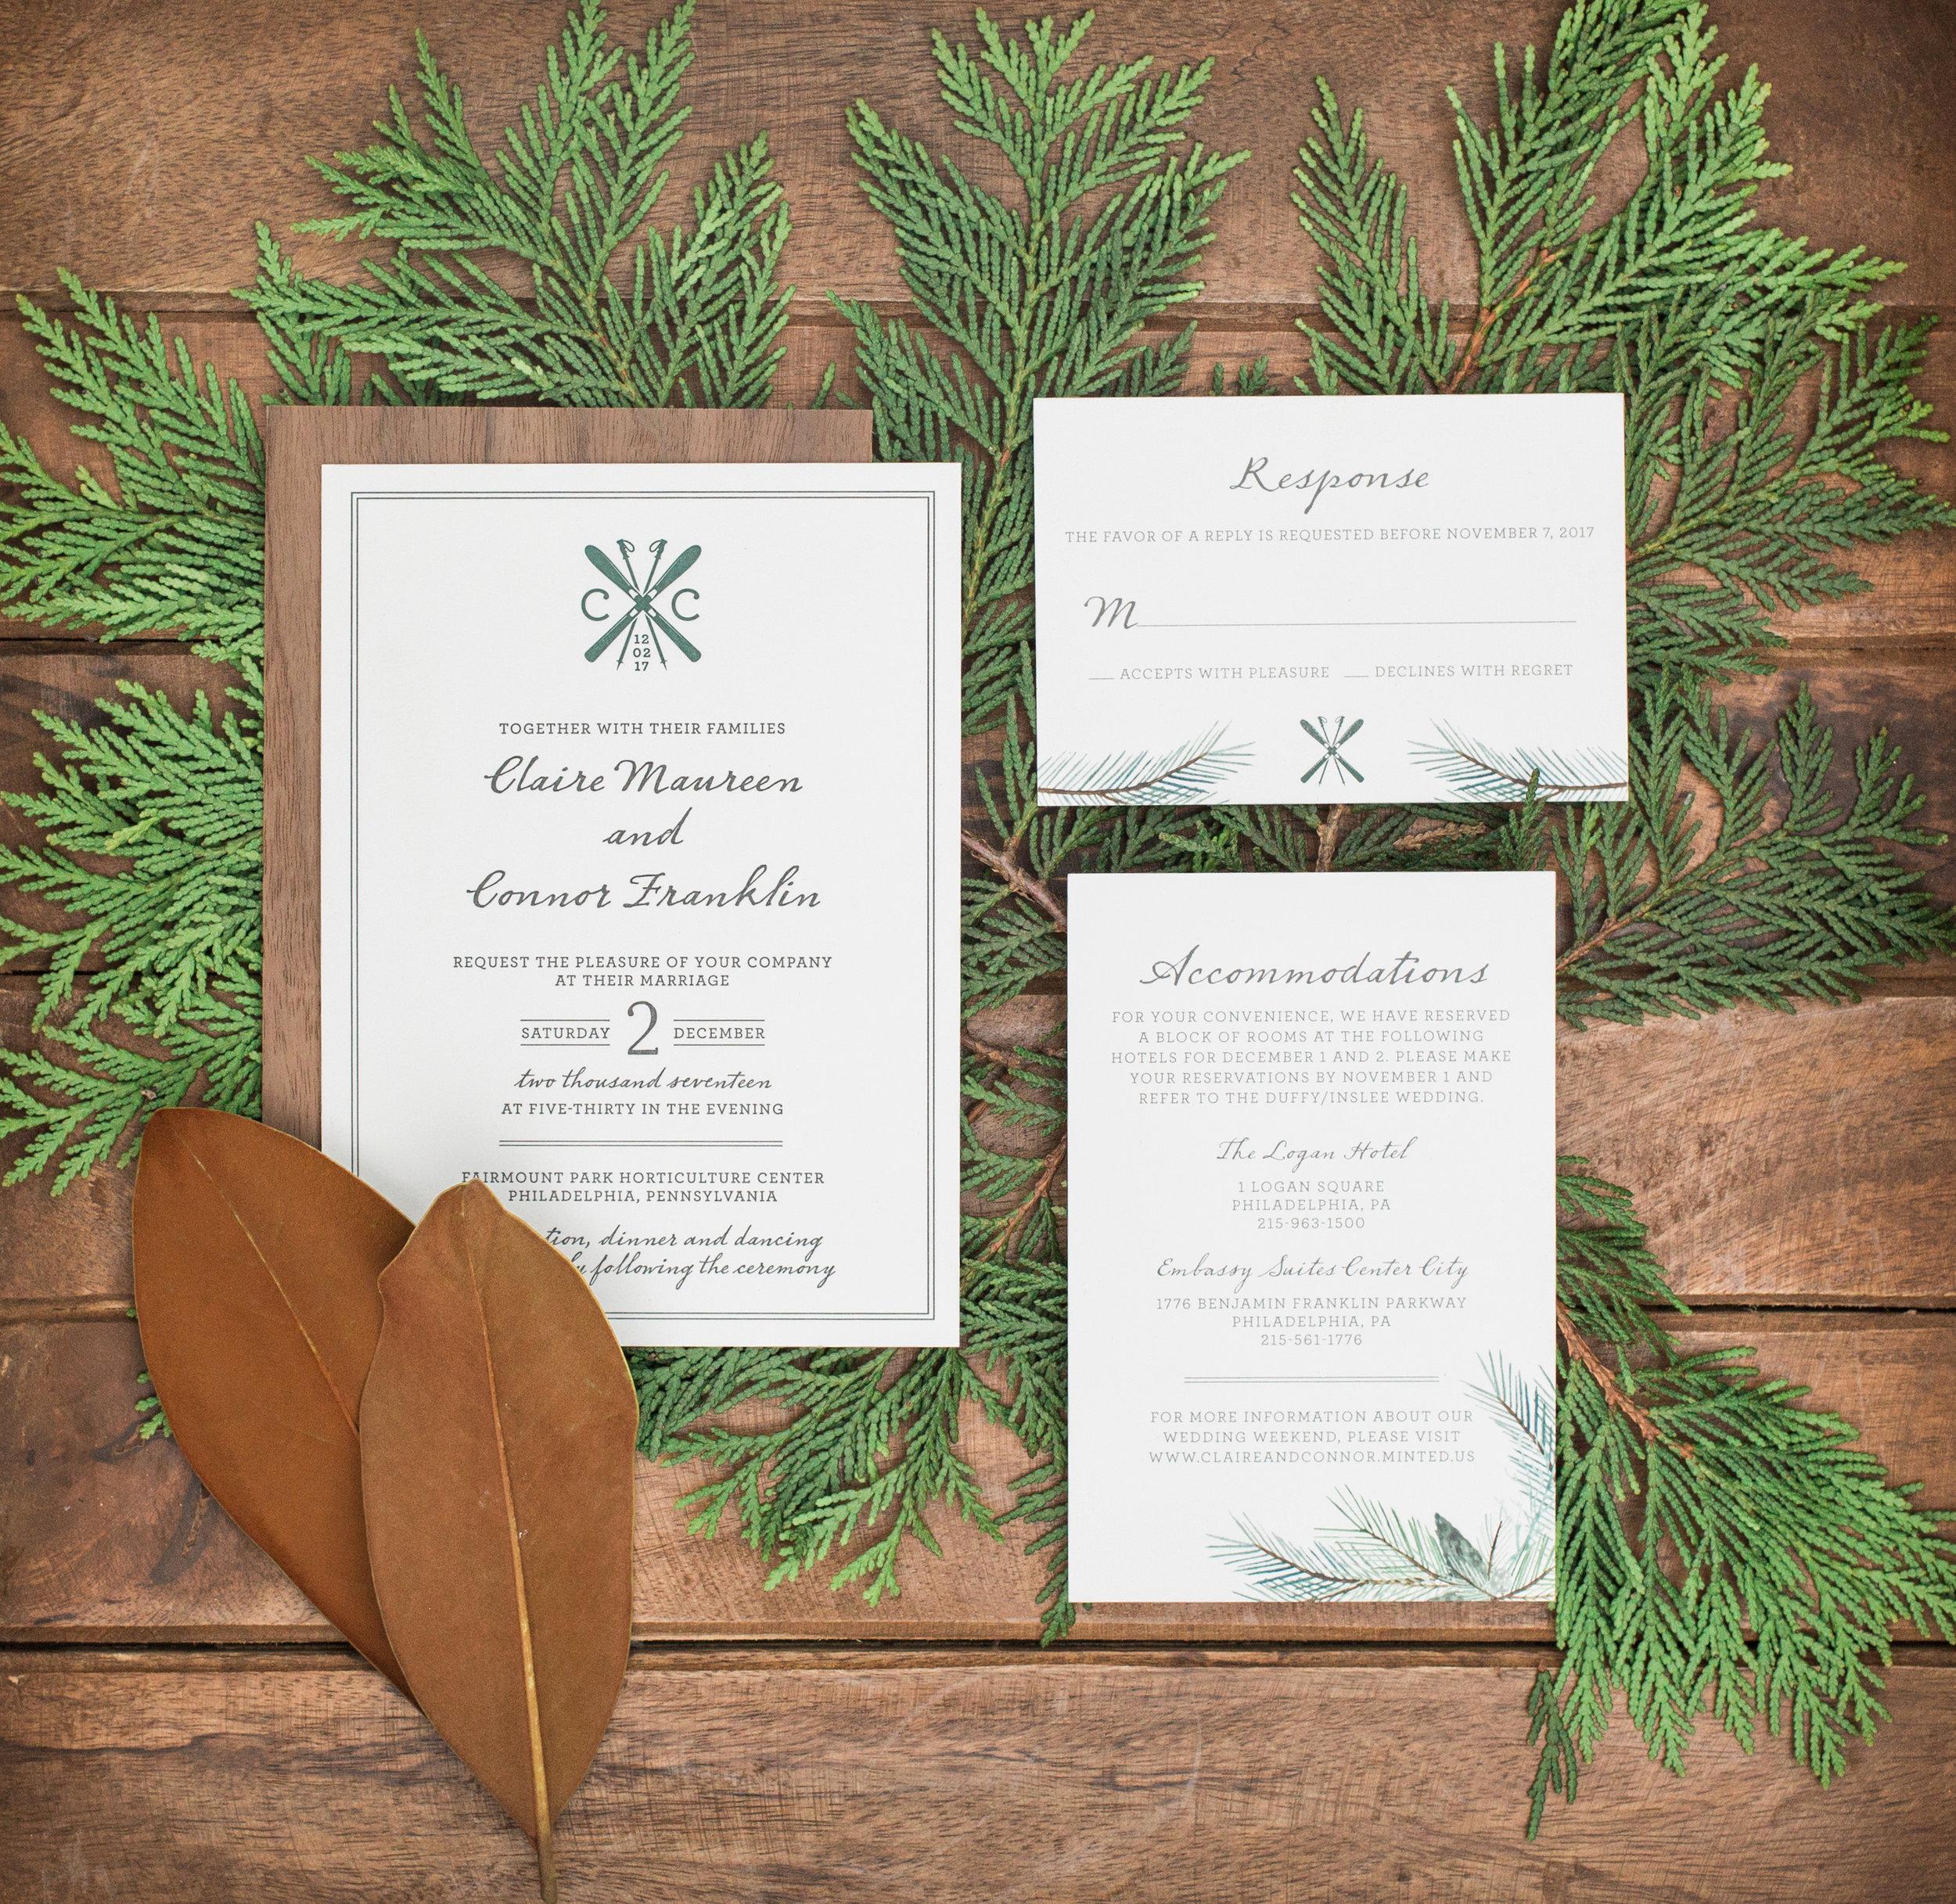 Hudson-Nichols-Martha-Stewart-Weddings-Winter-Ski-Philadelphia-Claire-Conner_012.jpg